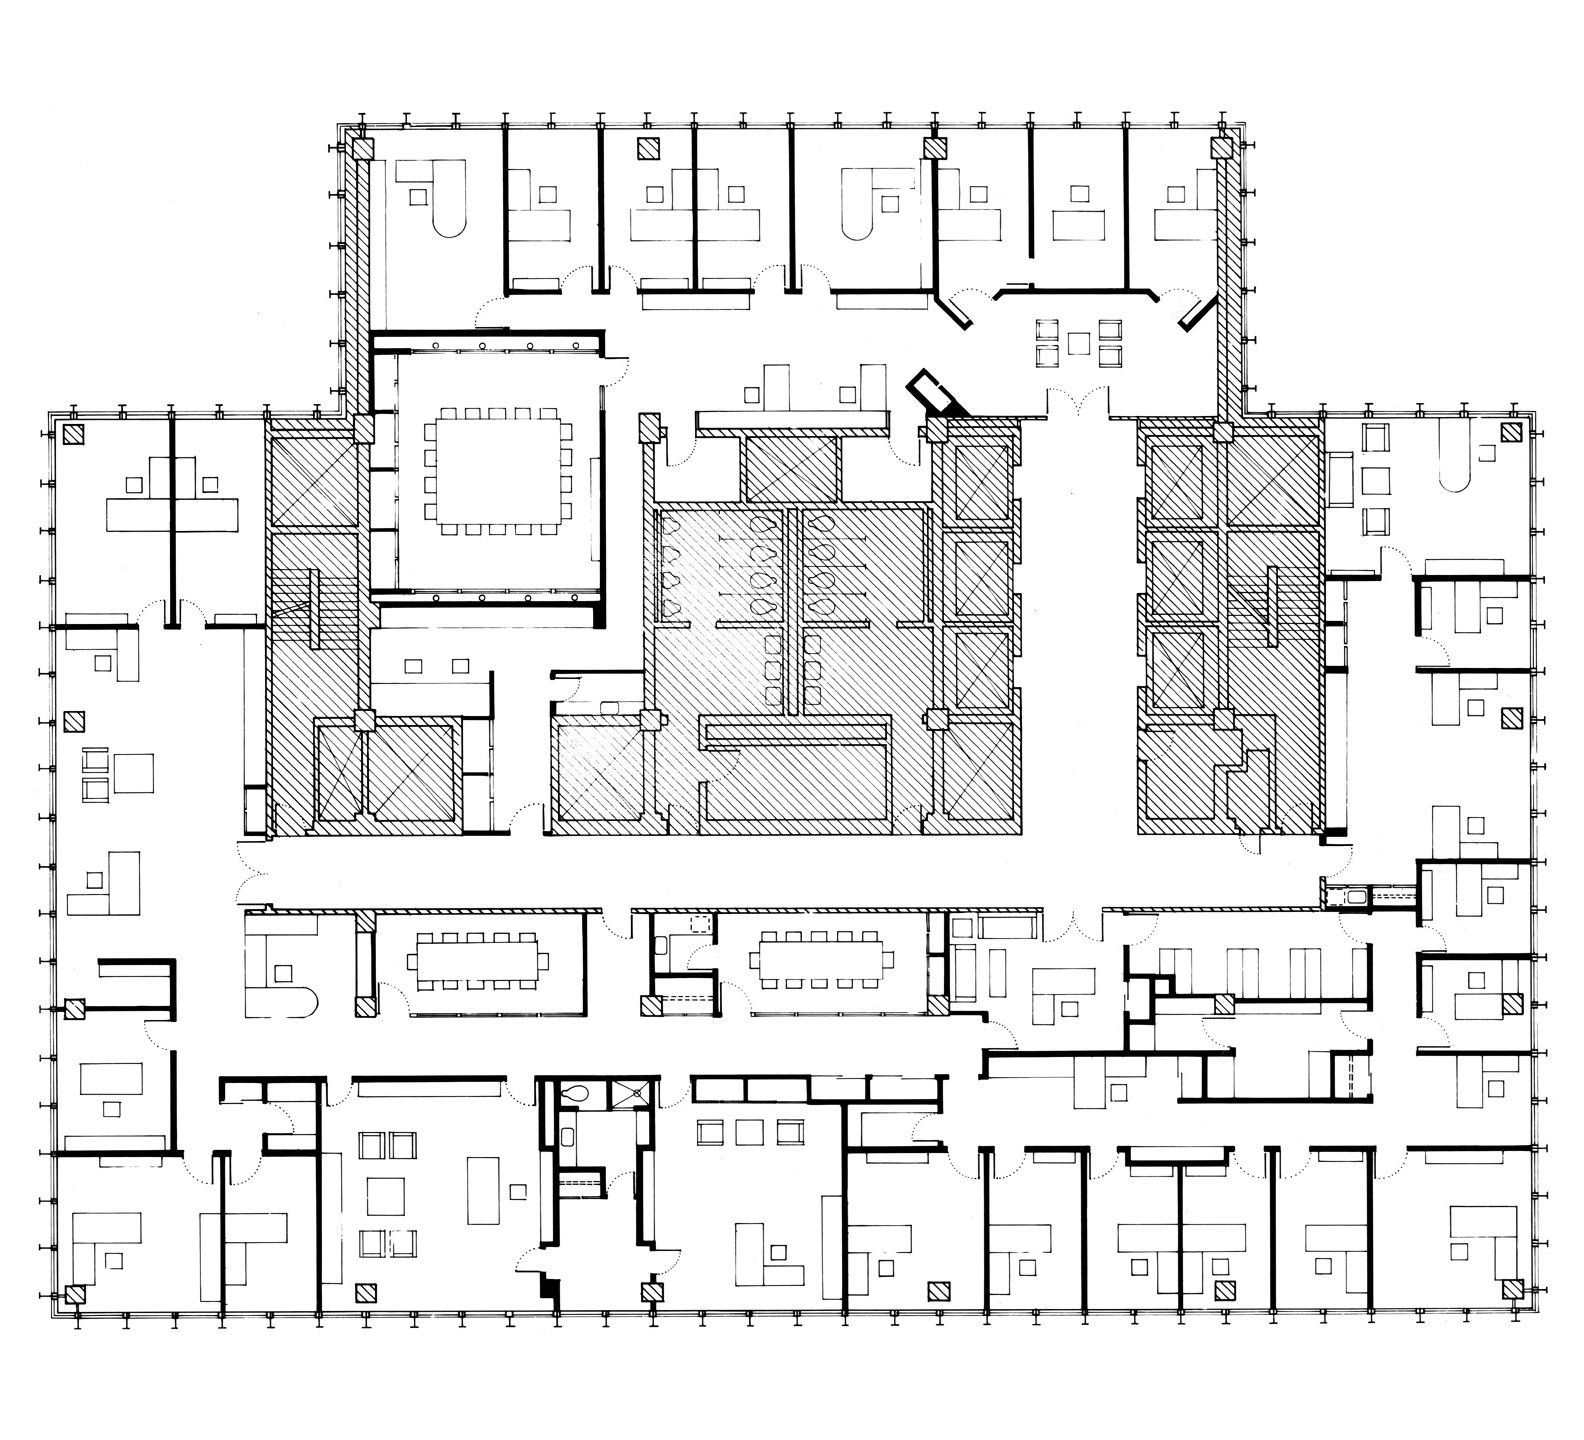 seagram building plan in the seagram building - Build A Floorplan